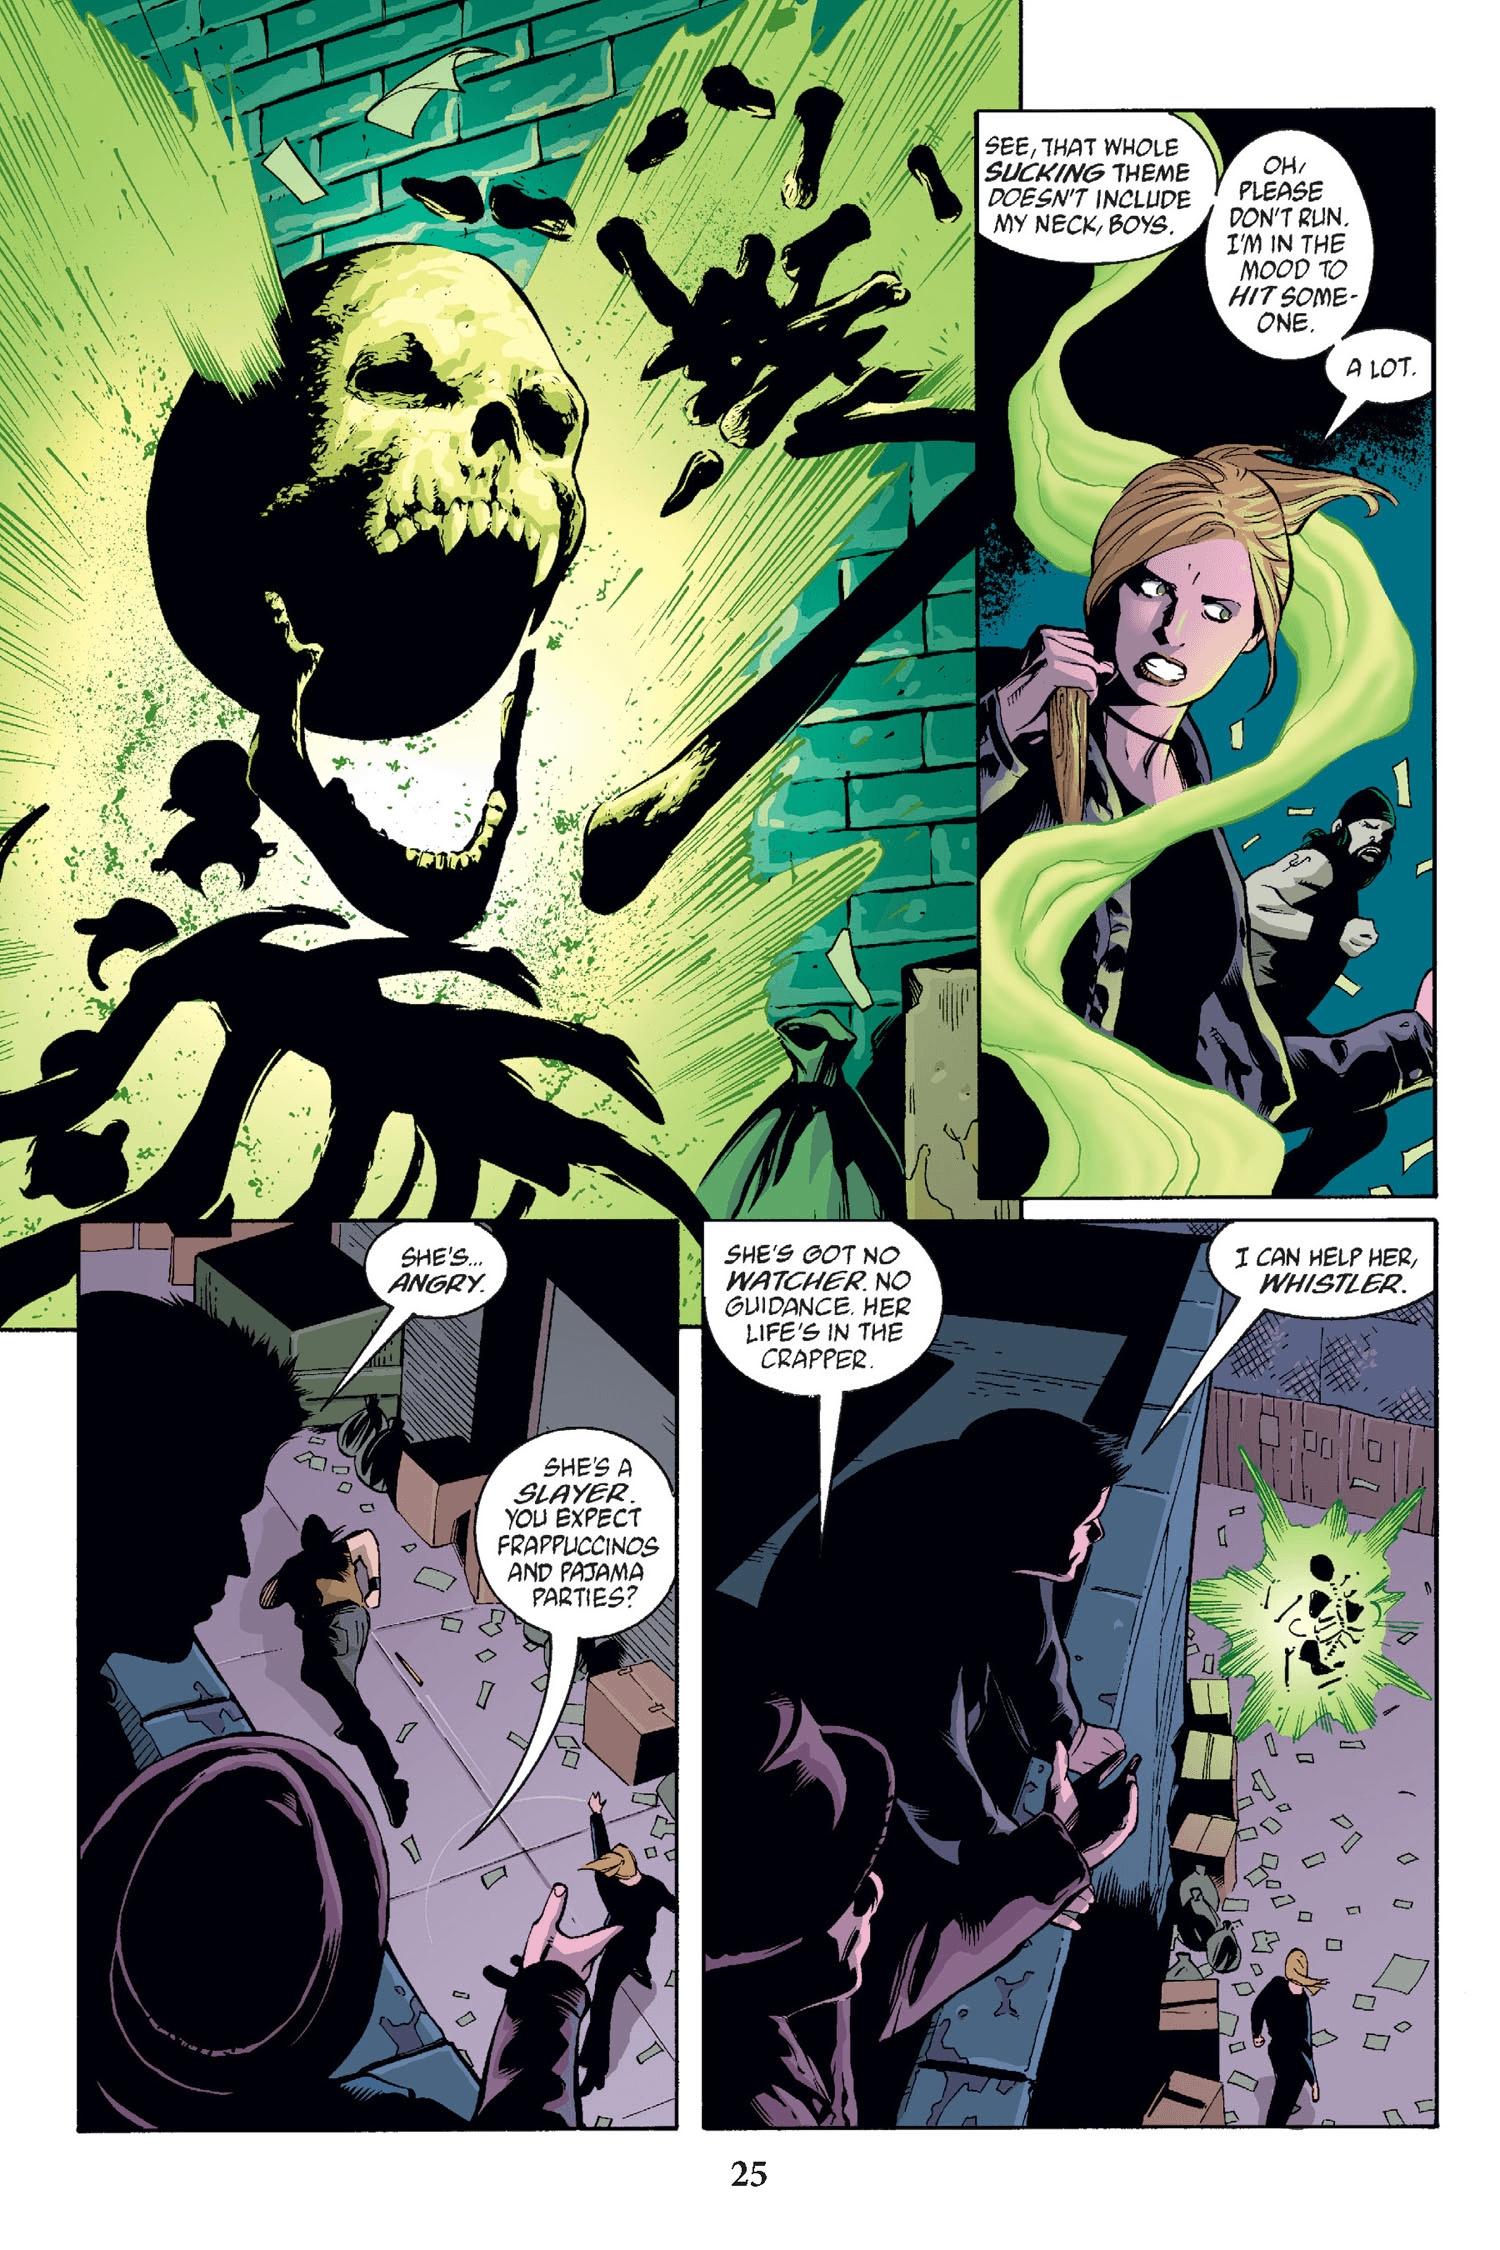 Read online Buffy the Vampire Slayer: Omnibus comic -  Issue # TPB 2 - 24